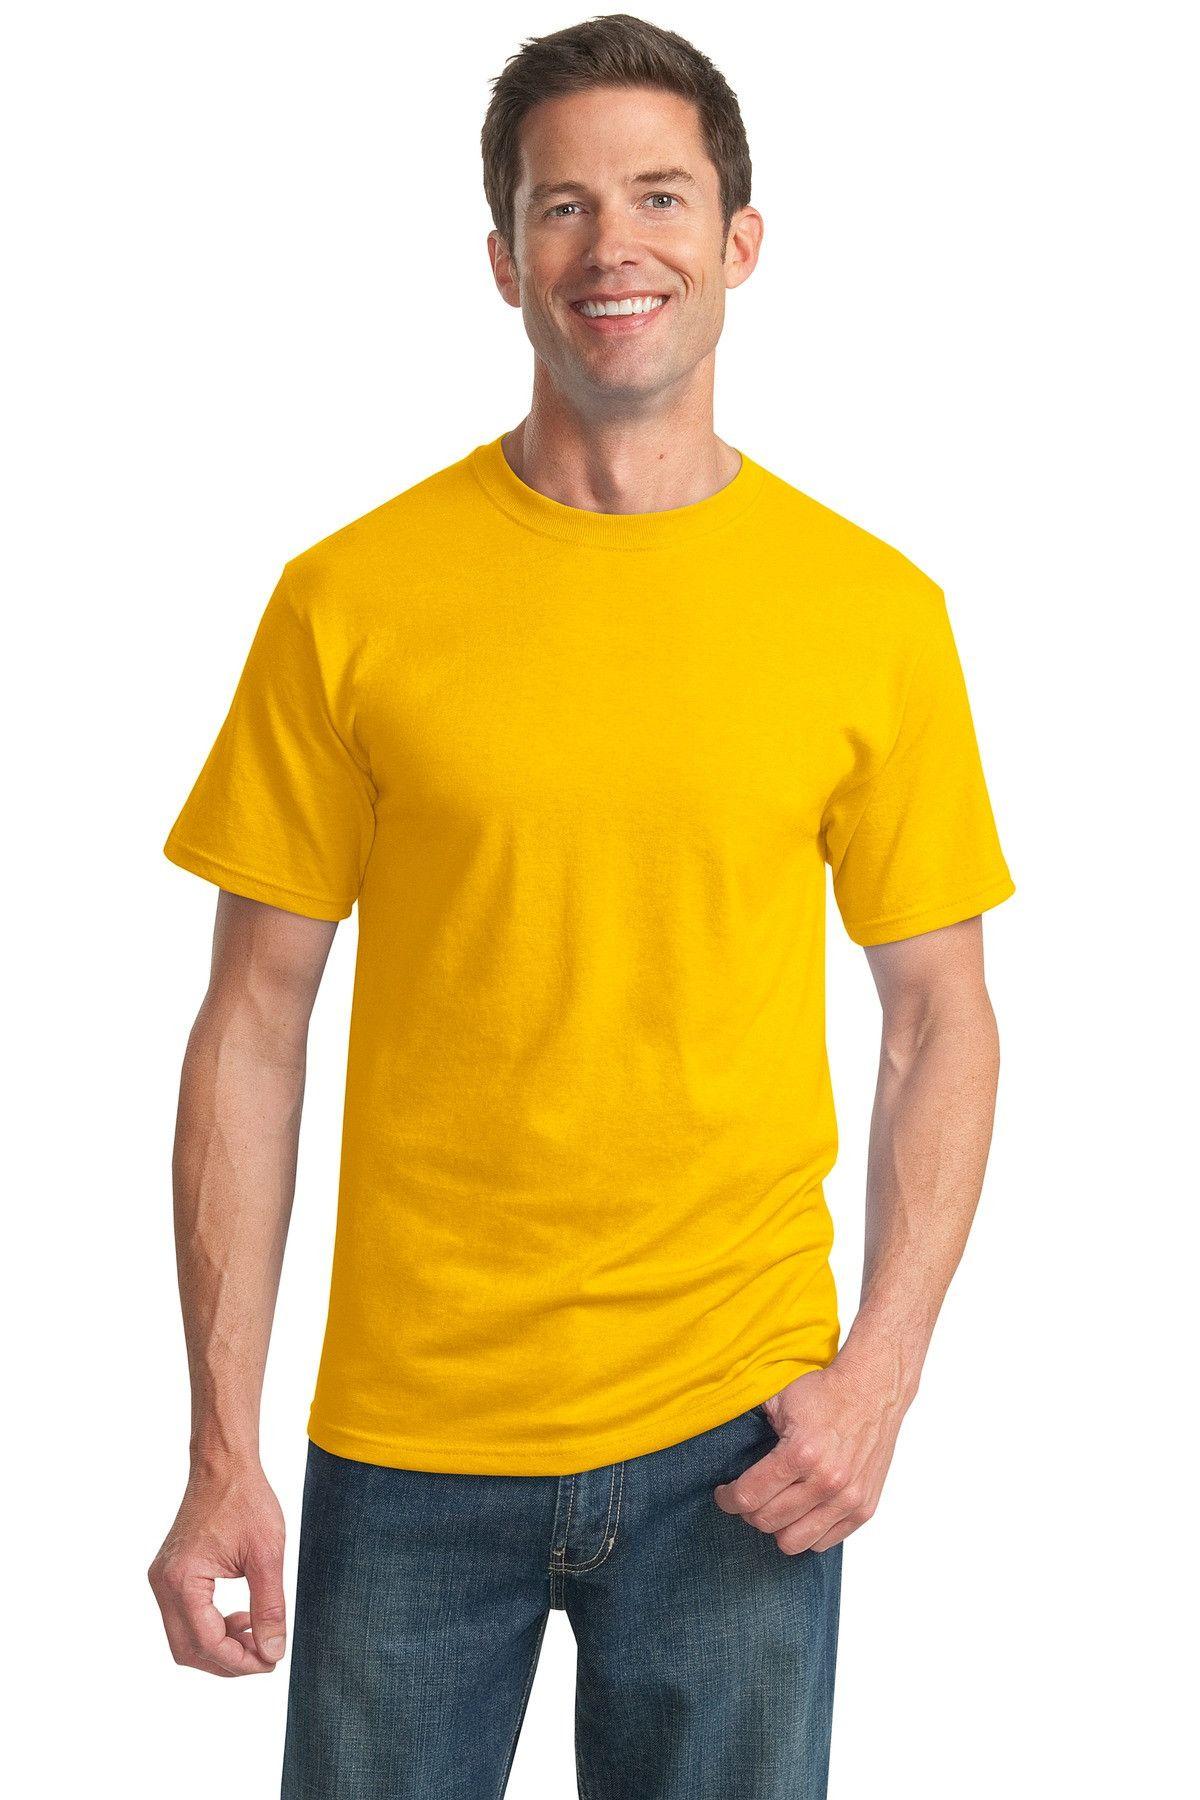 5a68dda0c4e JERZEES -Heavyweight Blend ™50 50 Cotton Poly T-Shirt.29M Island Yellow